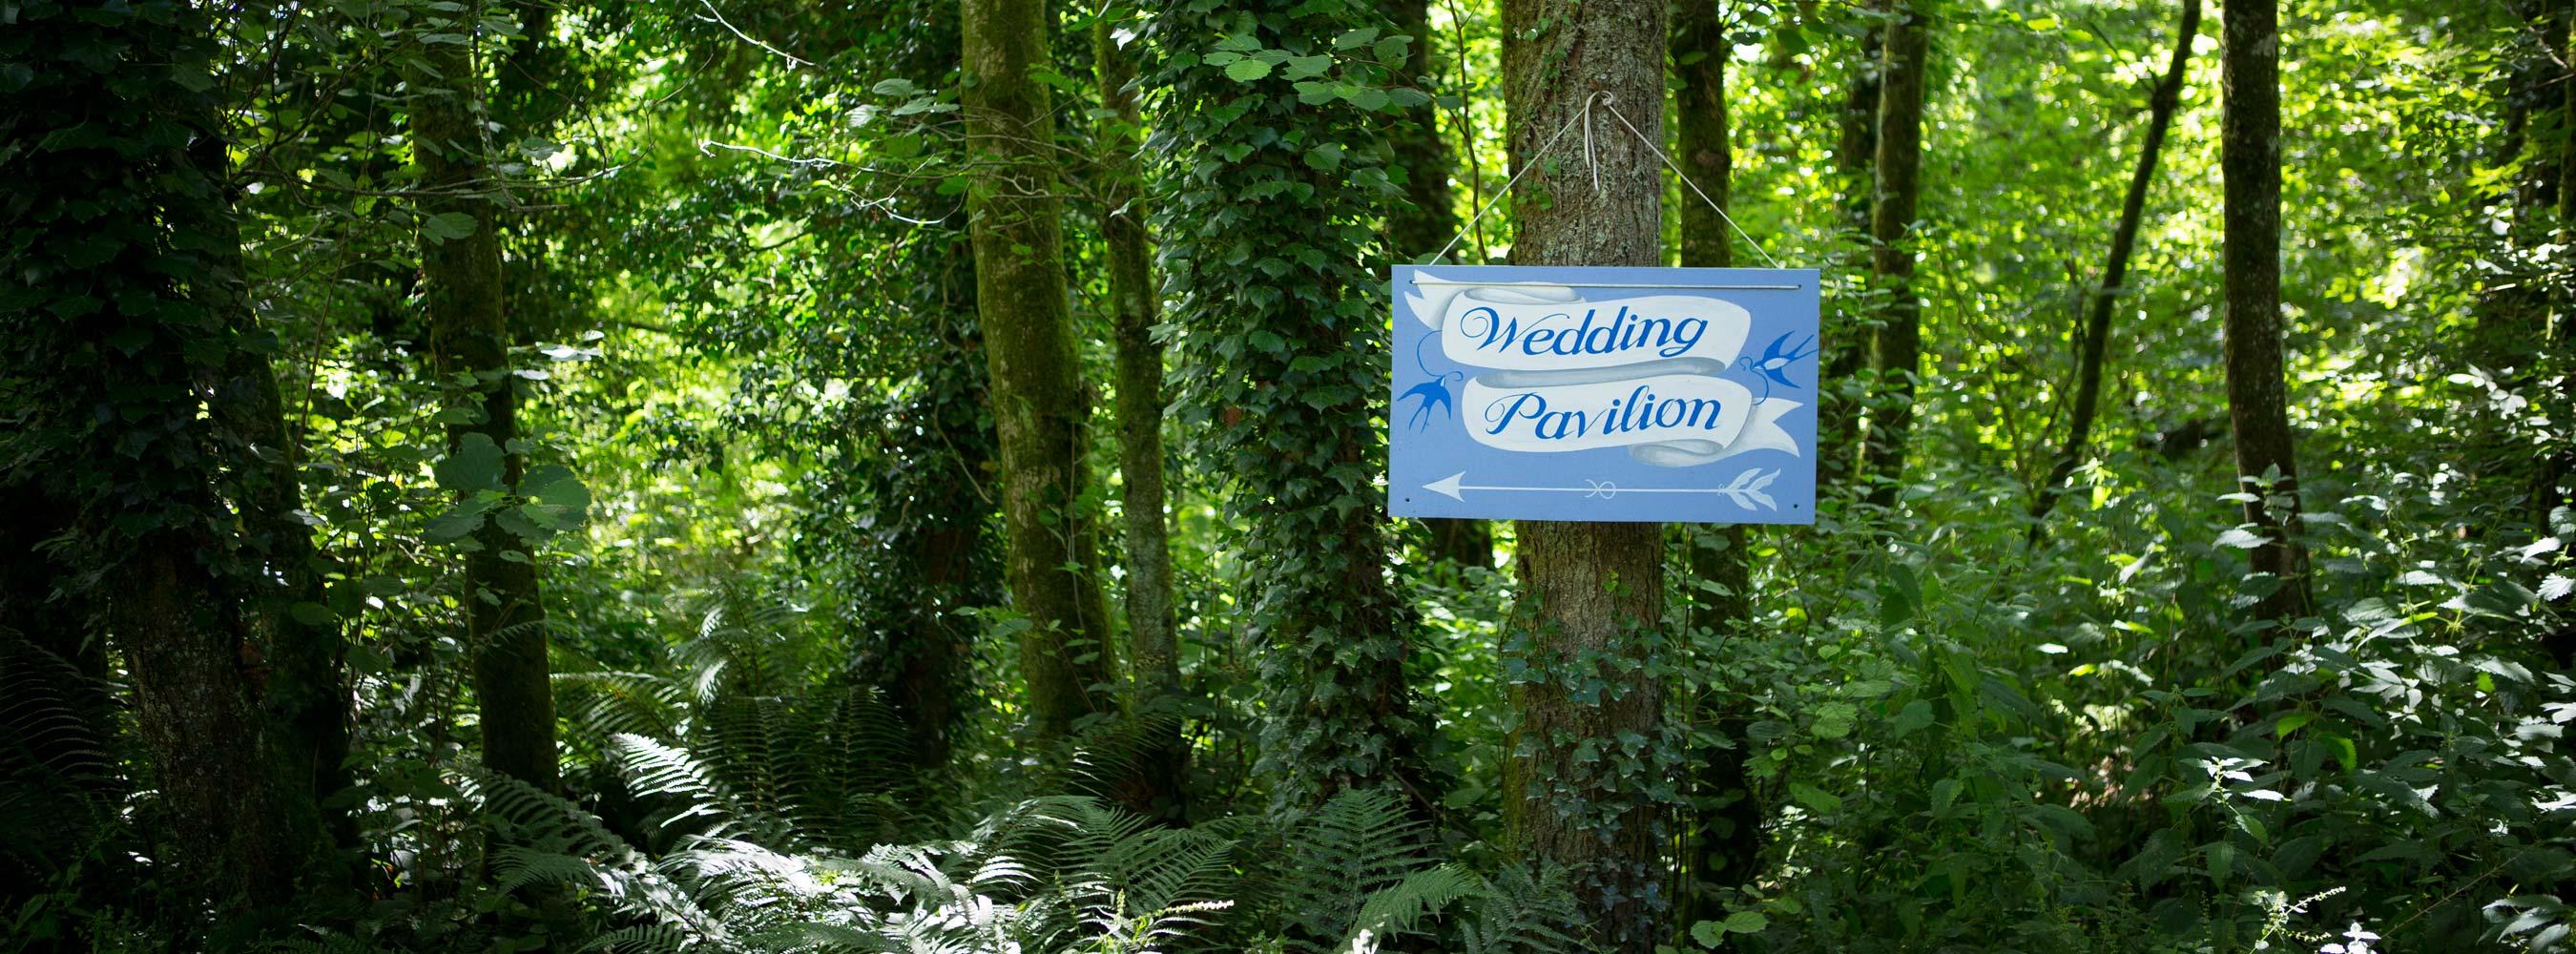 Wedding Pavilion Sign In Woods